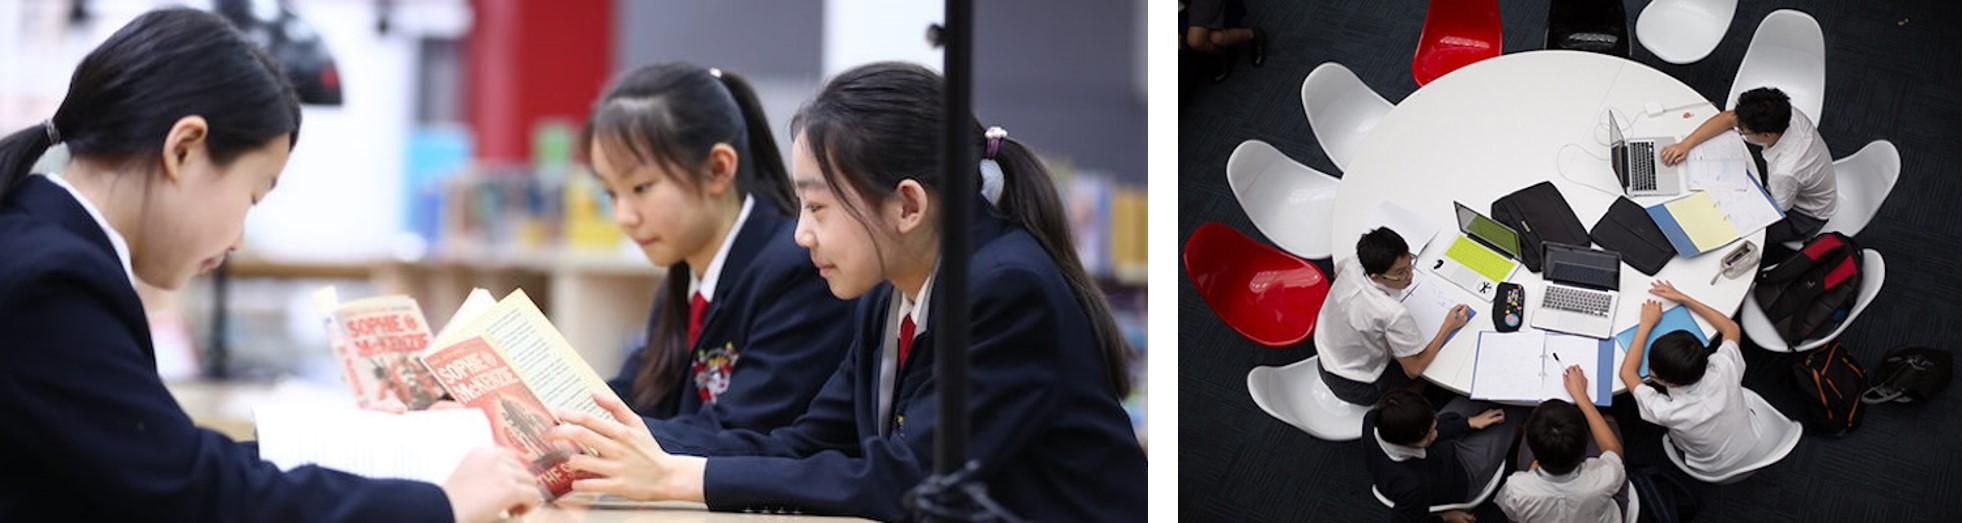 igcse-programme-student-learning-北京德威英国国际学校